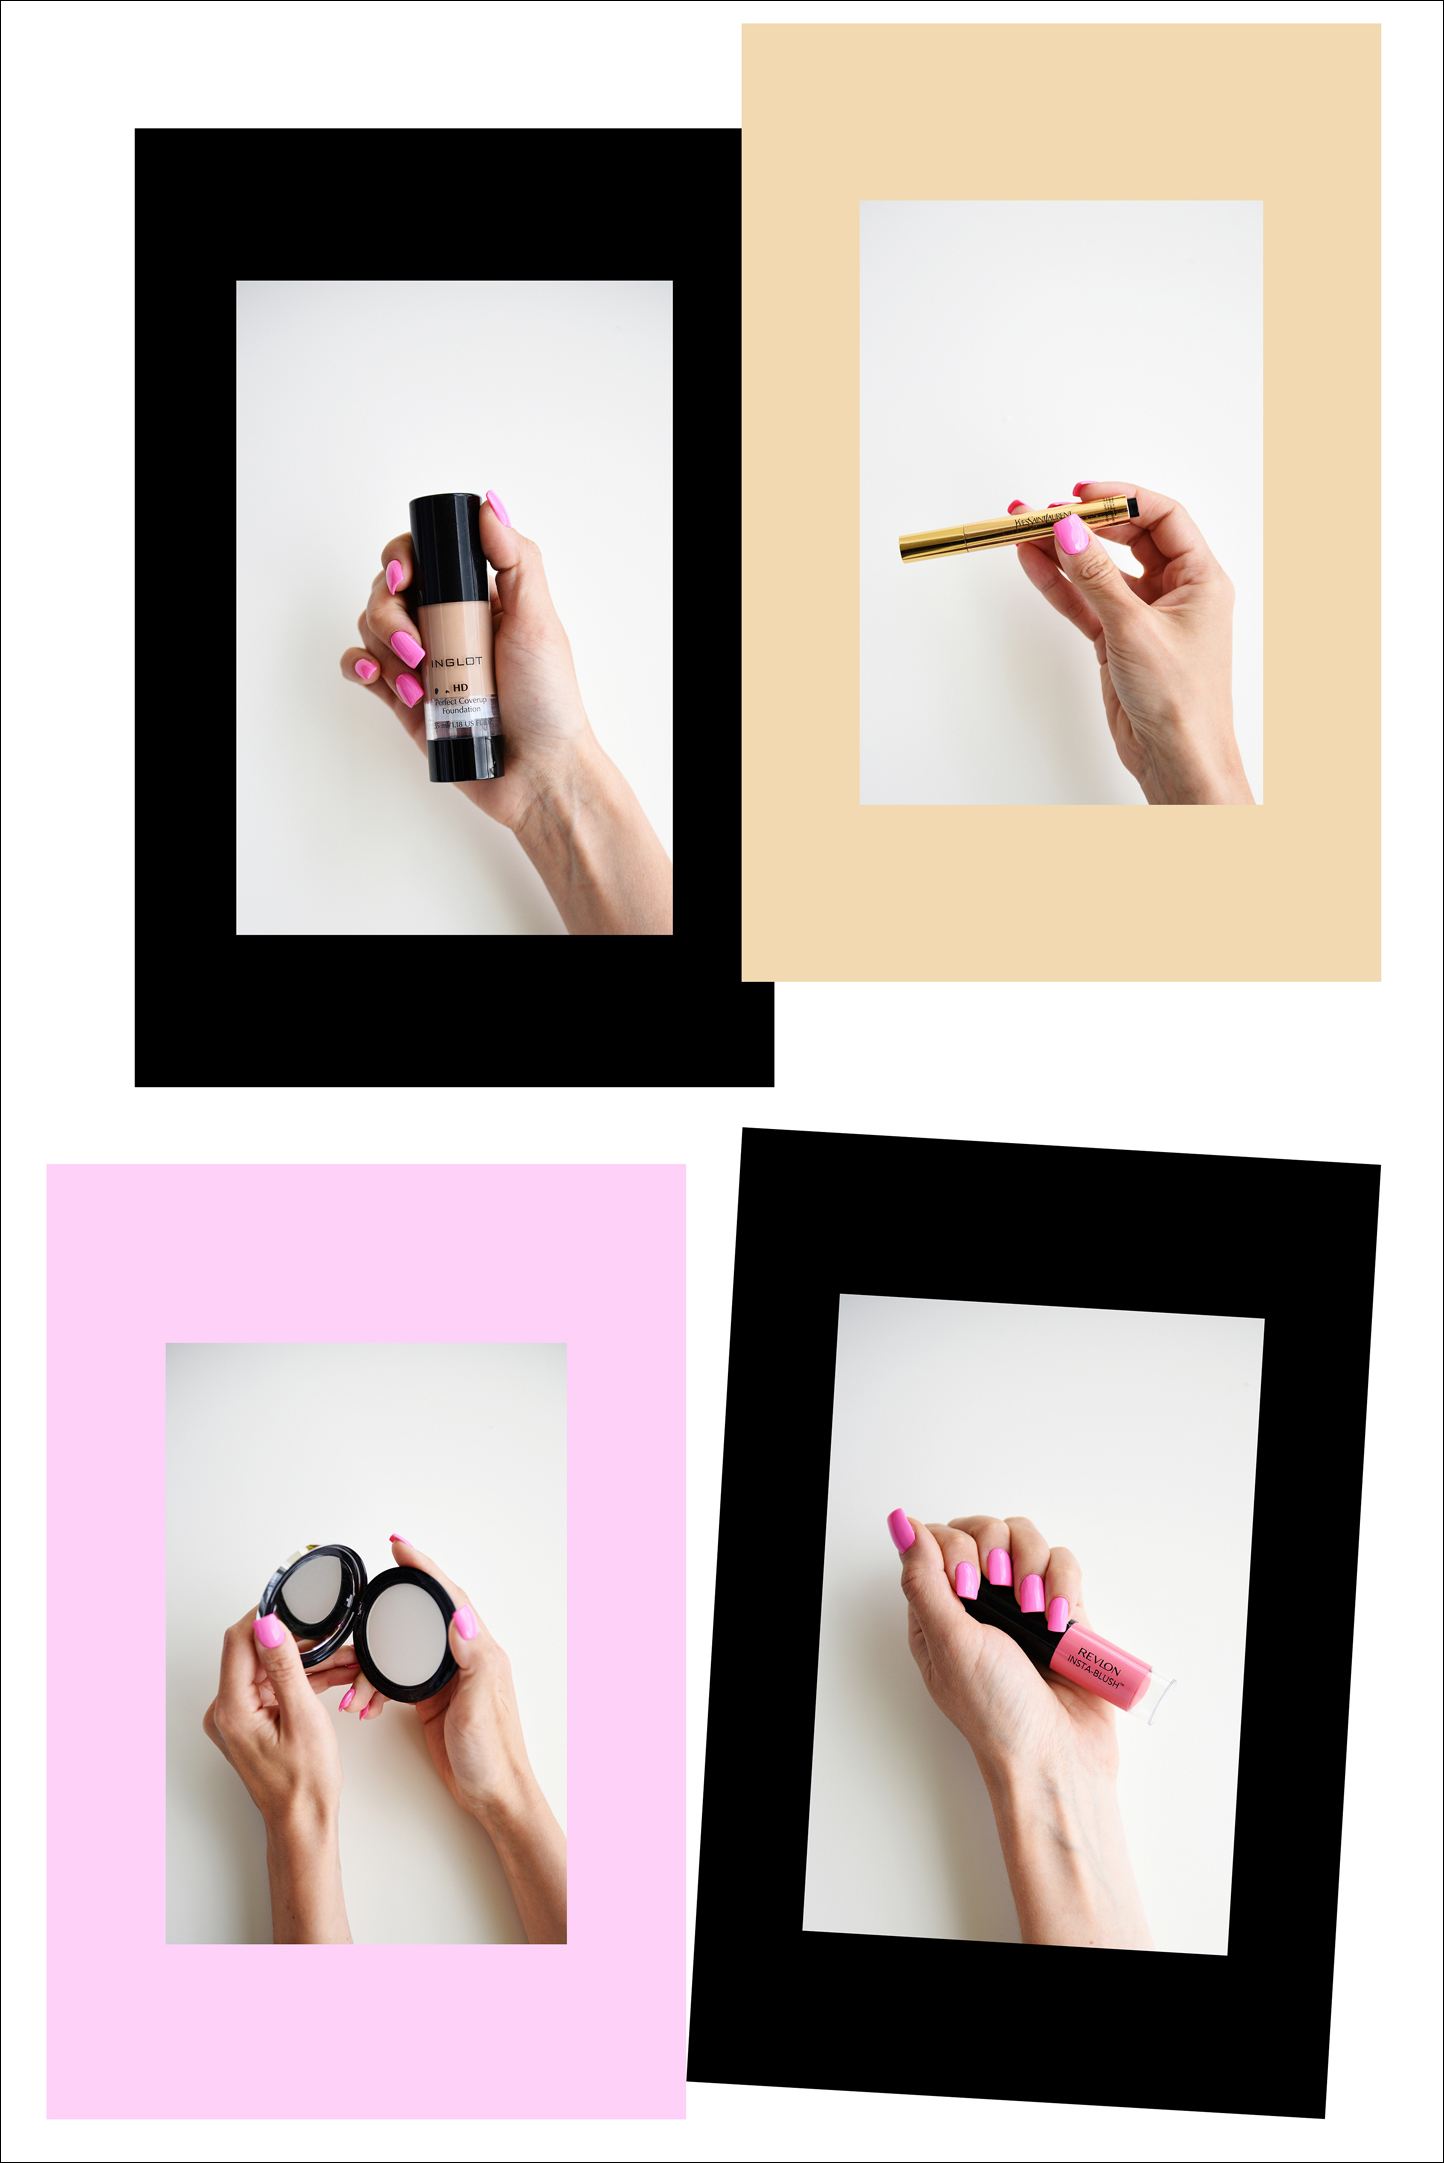 rebellook recenzje kosmetyków (15)